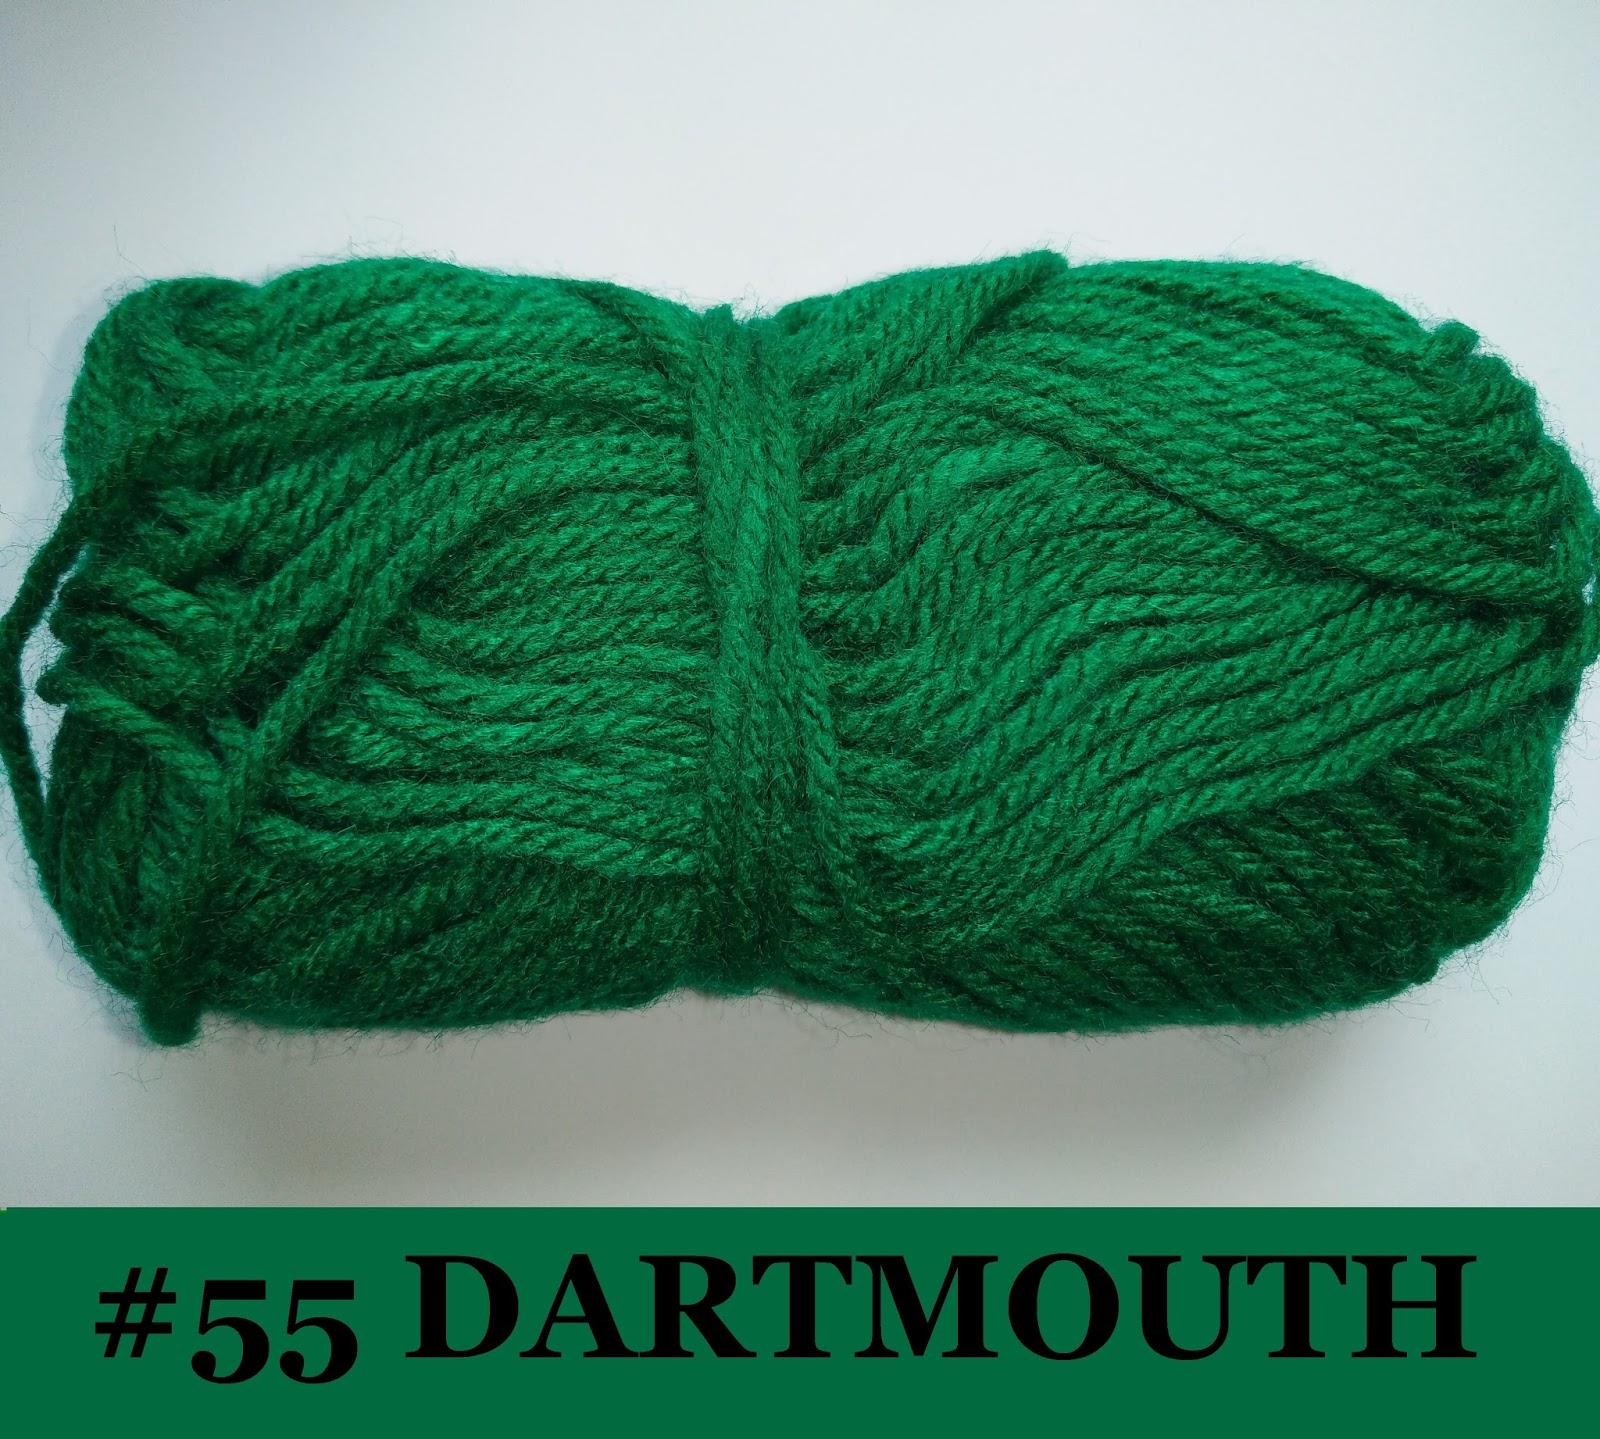 Dartmouth hookup